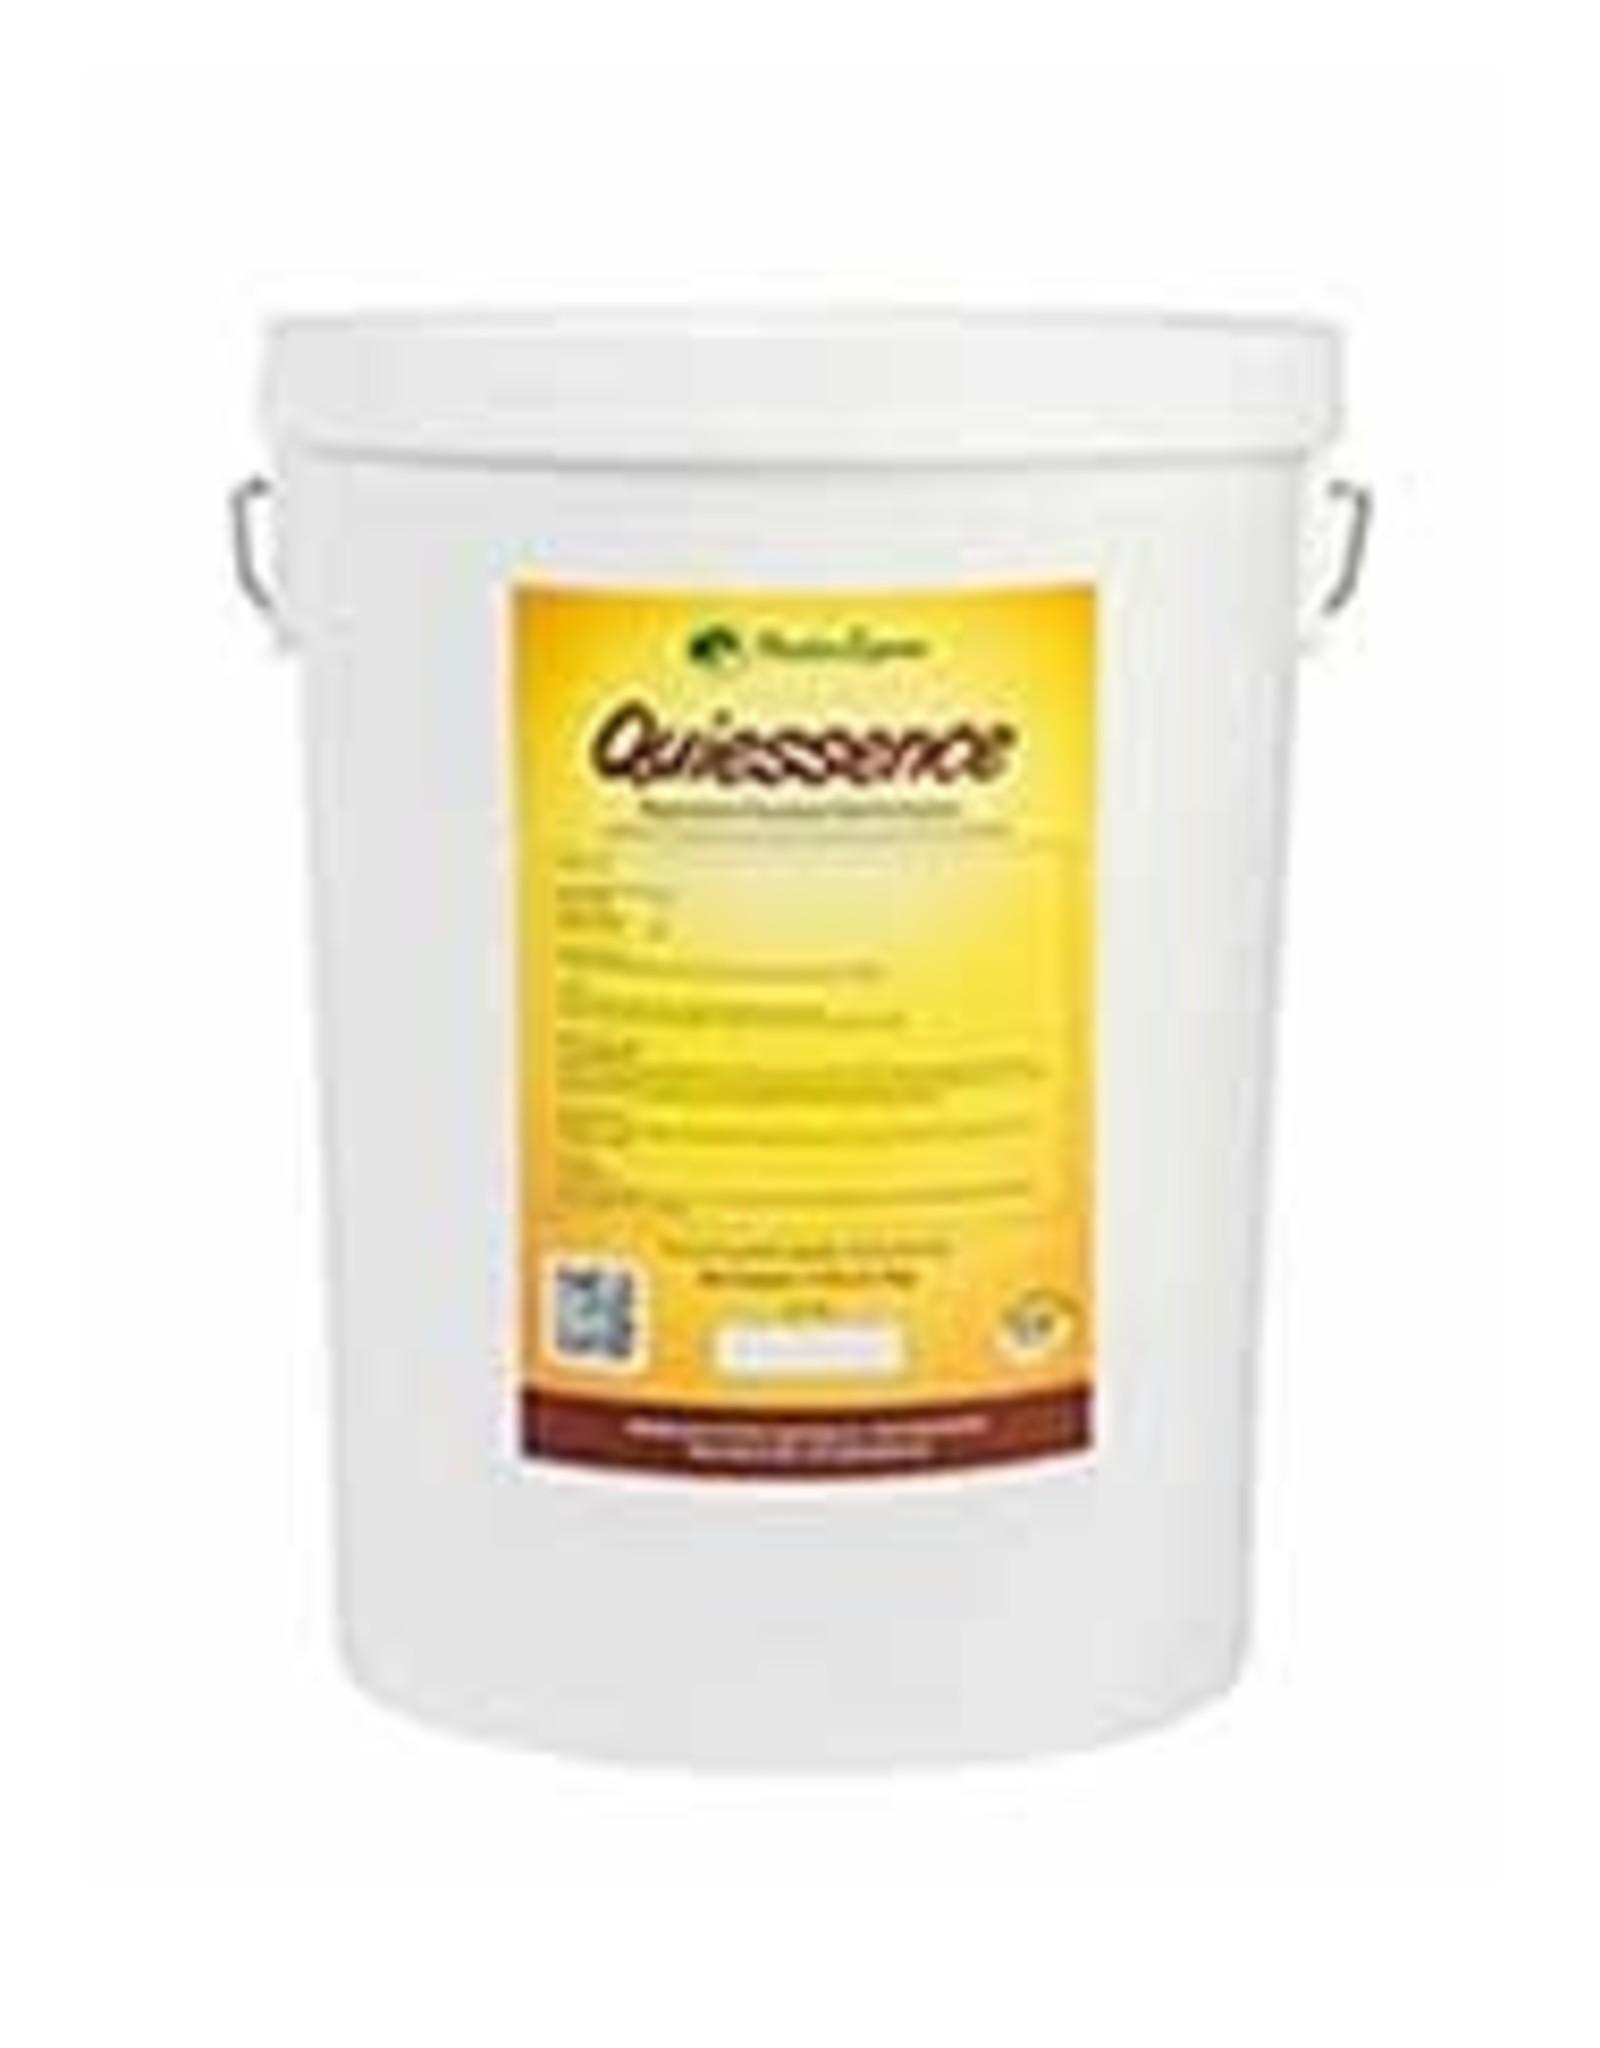 Foxden Equine Inc. Quiessence 5lb